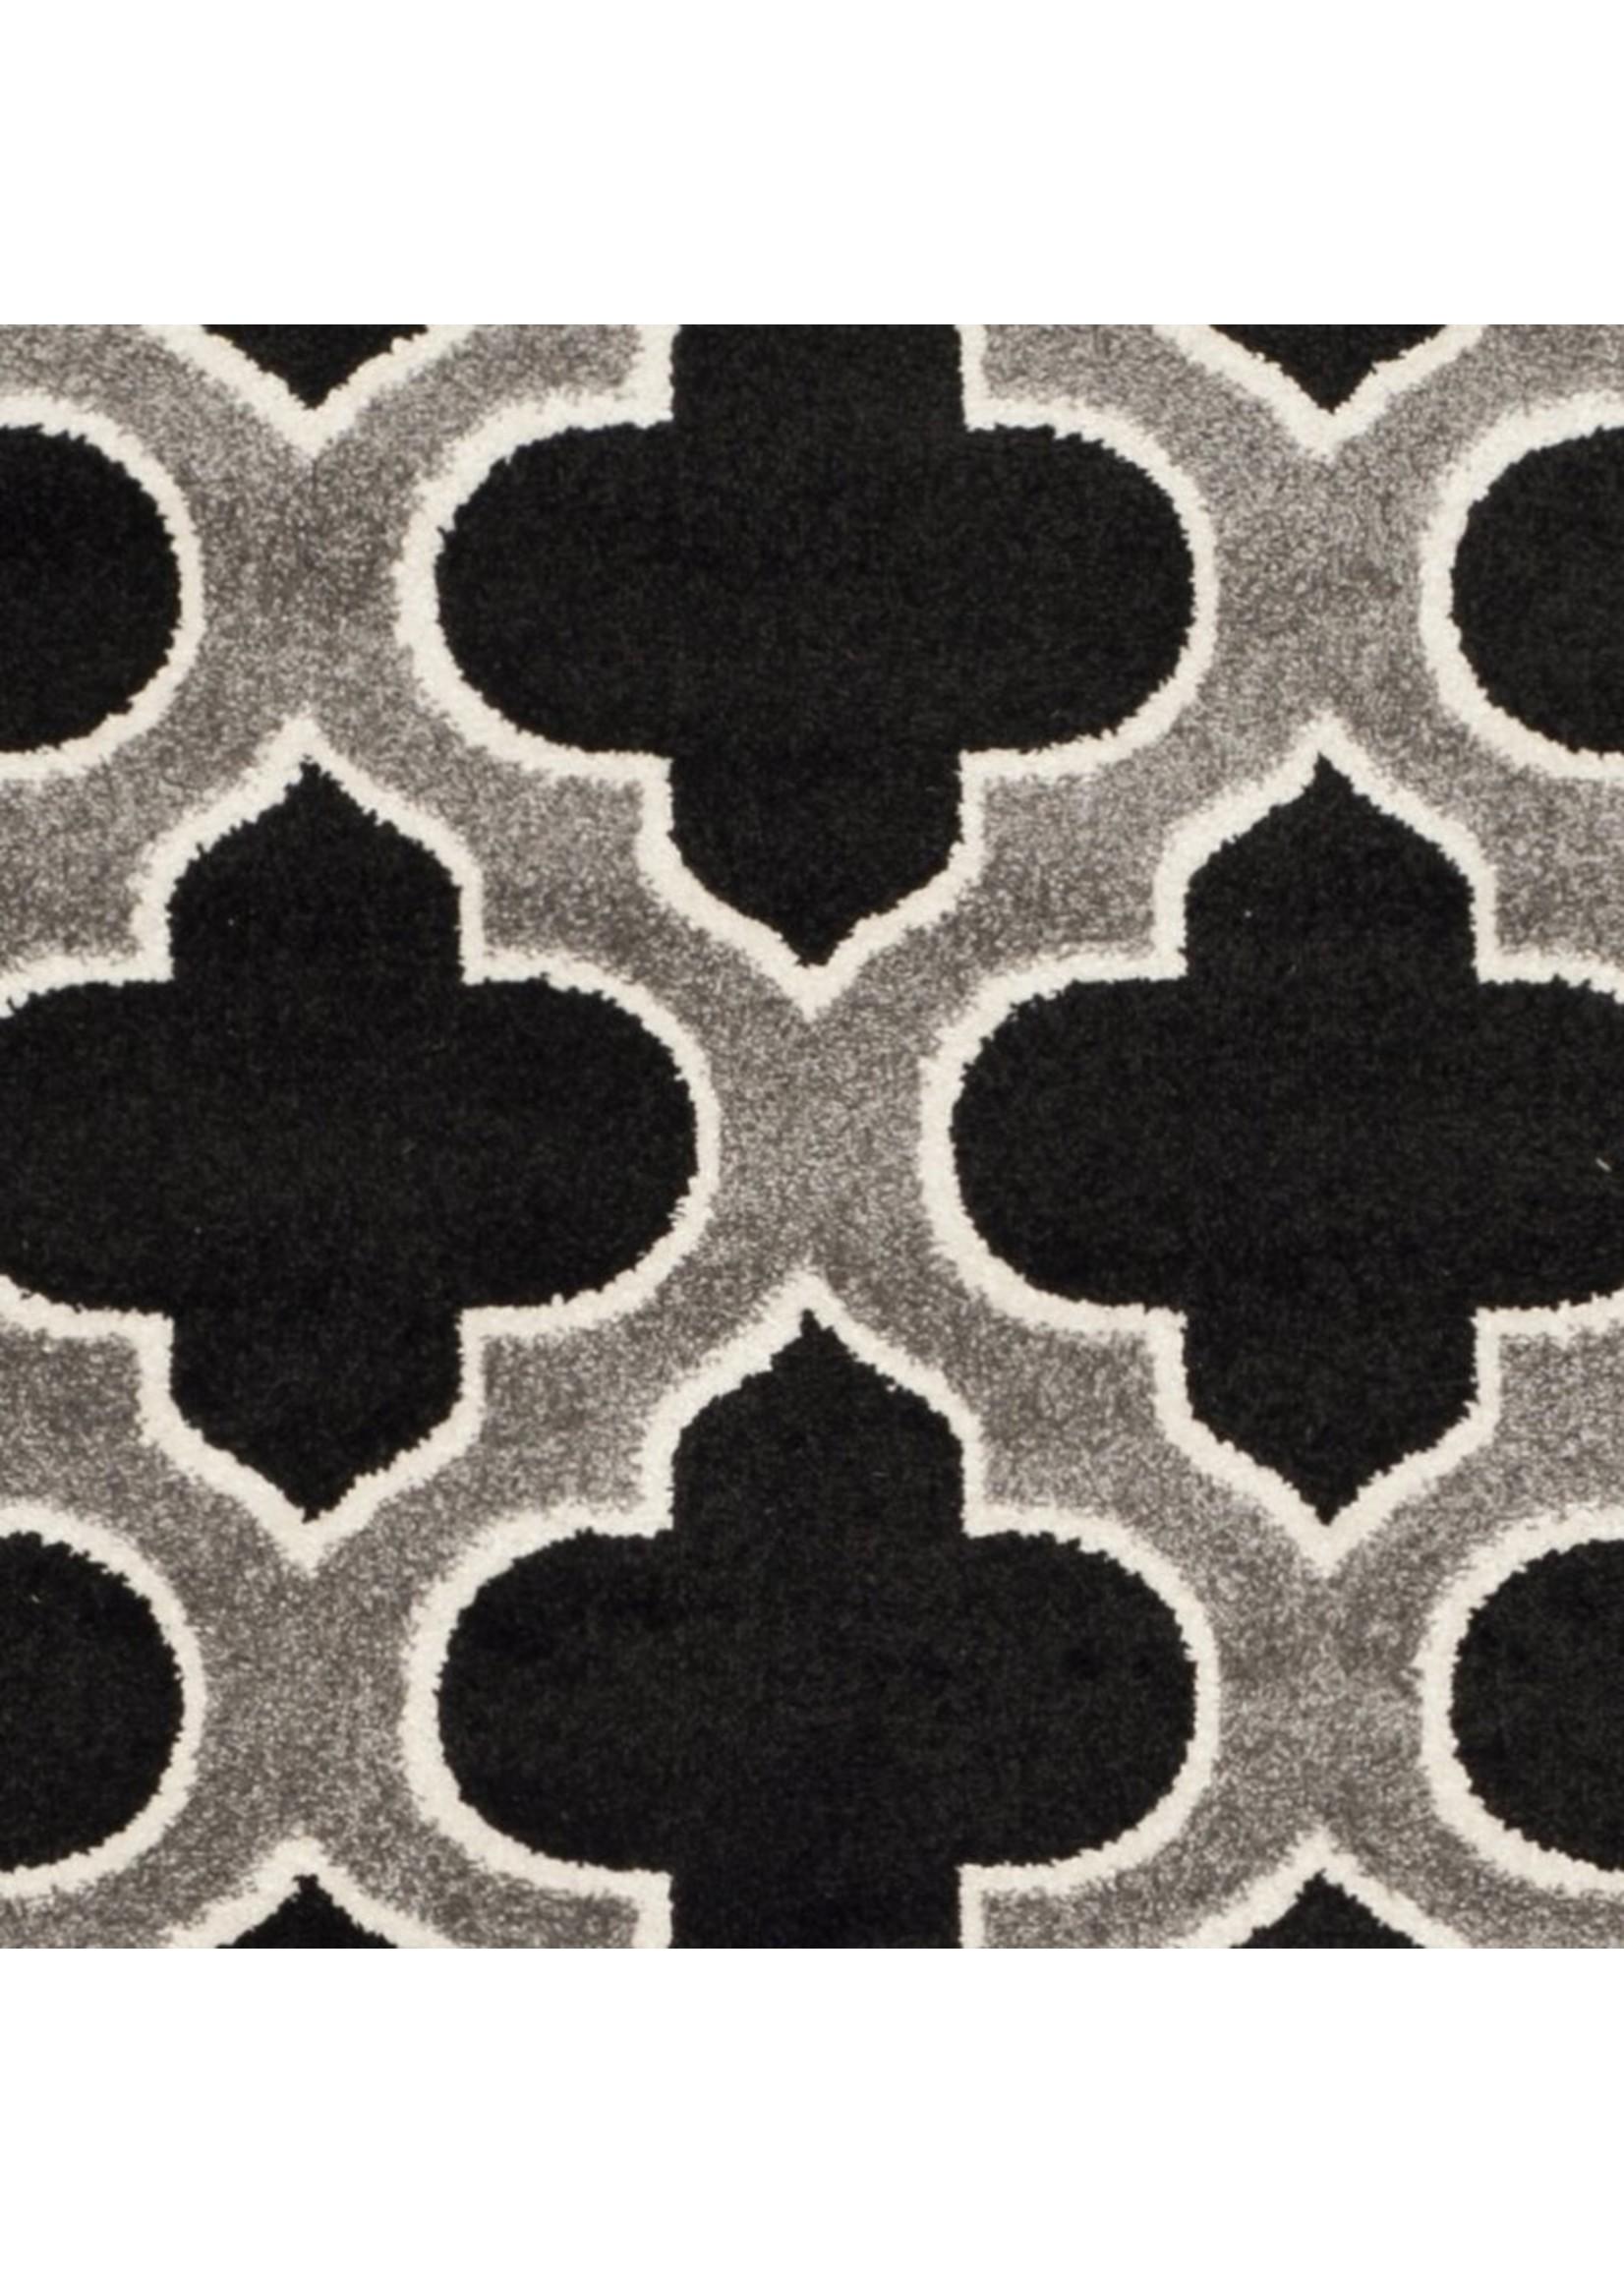 * 9' x 12' - Dombrowski Geometric Anthracite/Gray Area Rug